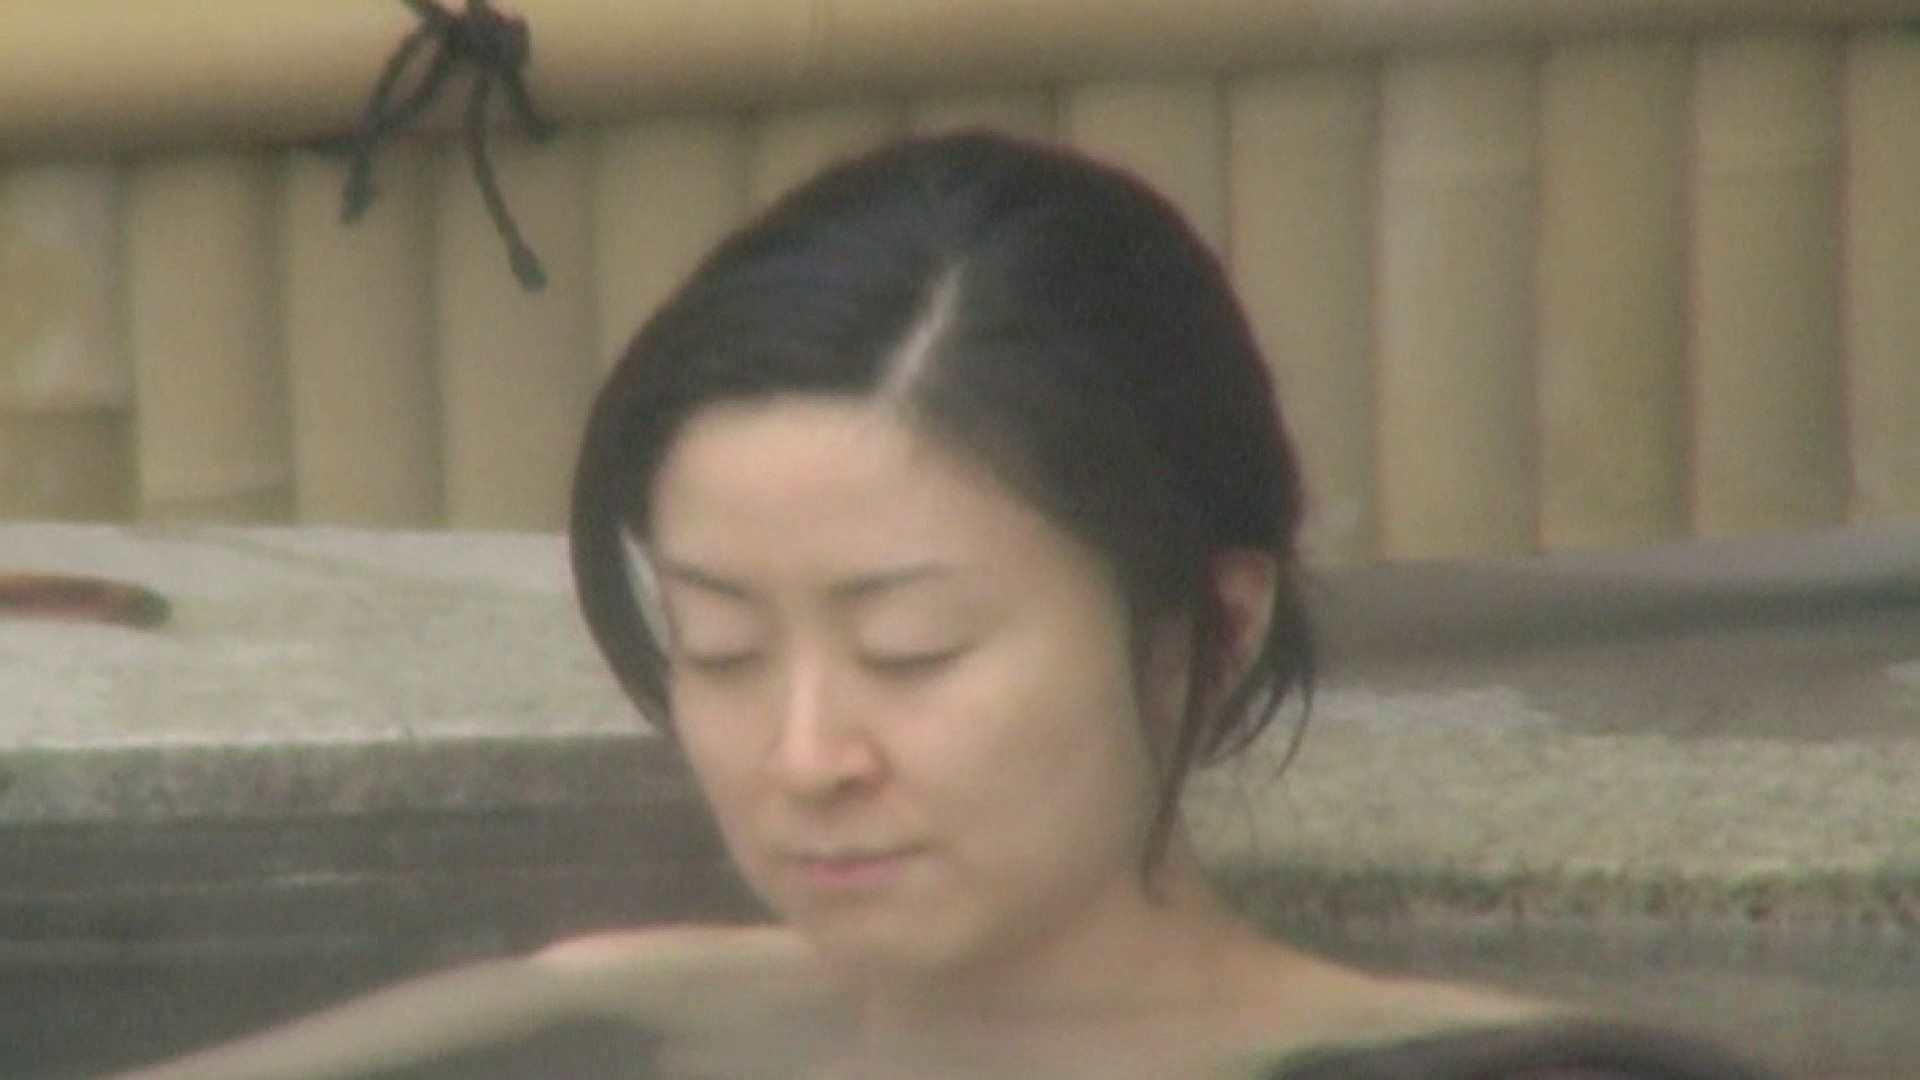 Aquaな露天風呂Vol.548 盗撮  97連発 29